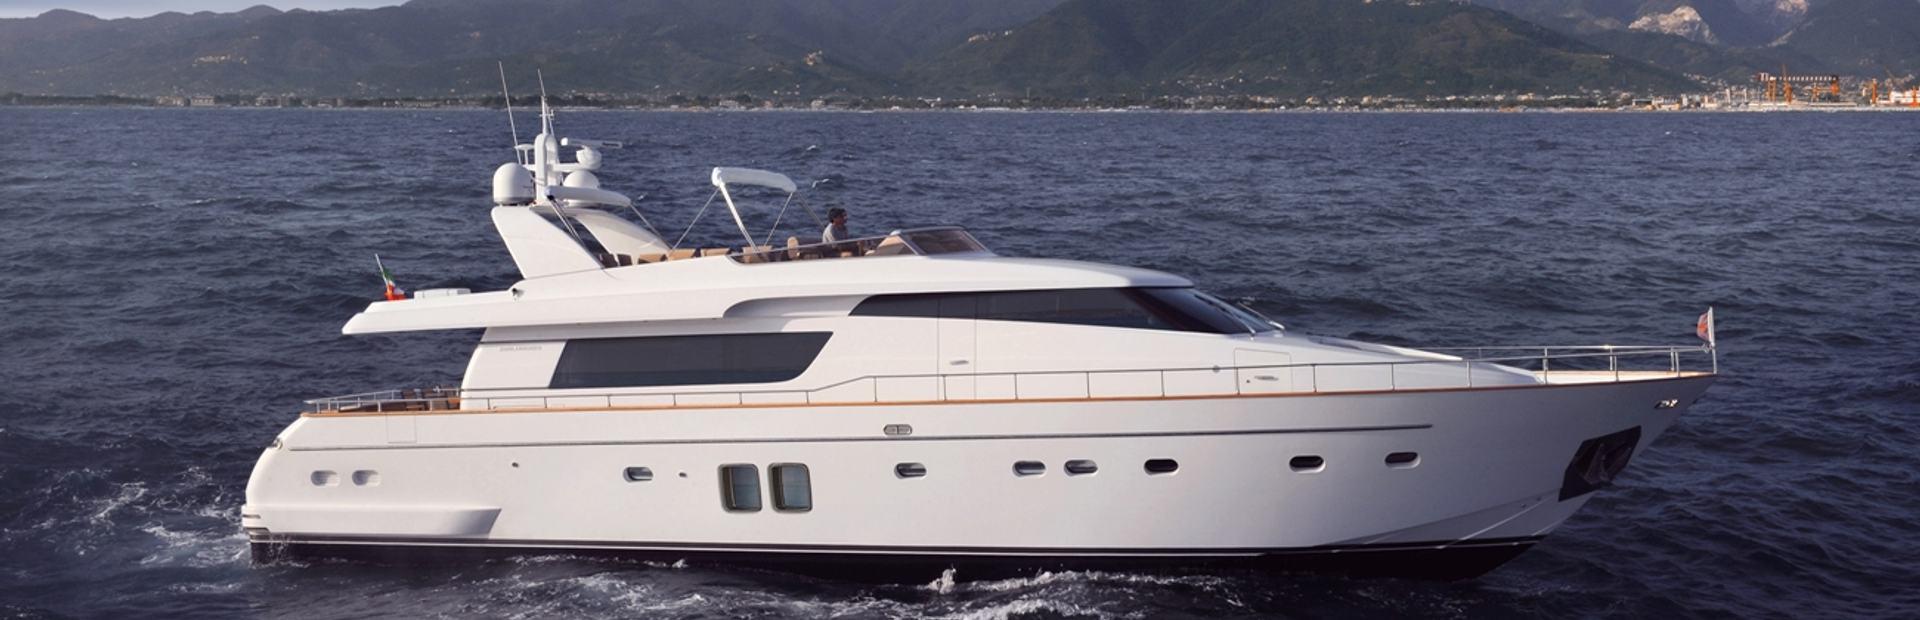 SL82 Yacht Charter